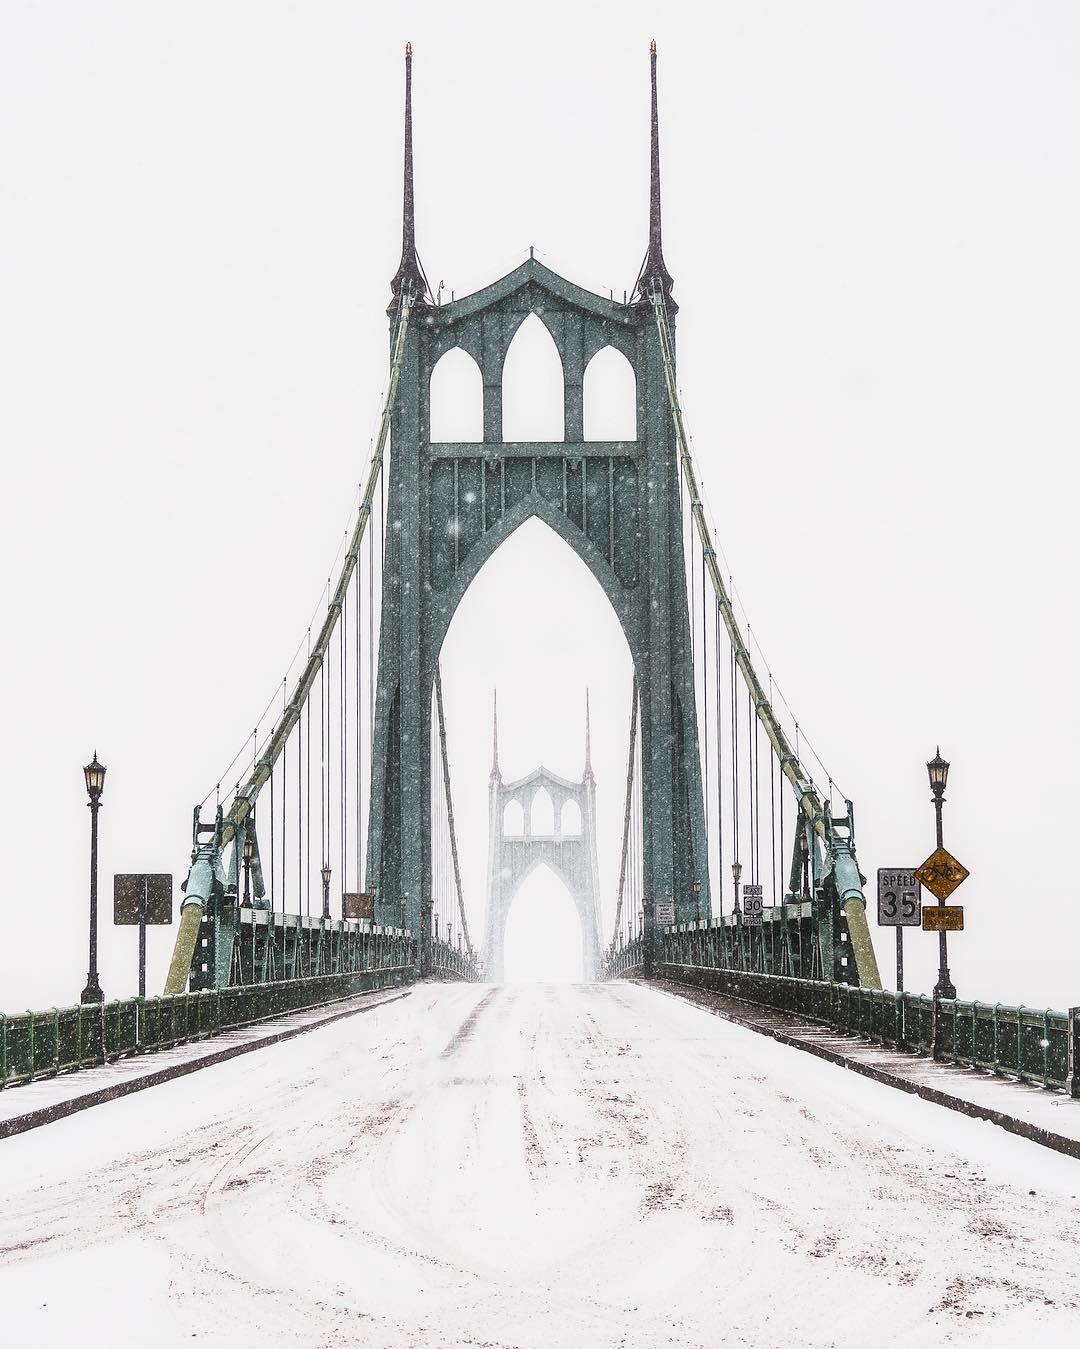 St johns bridge credit ig gettyphotography